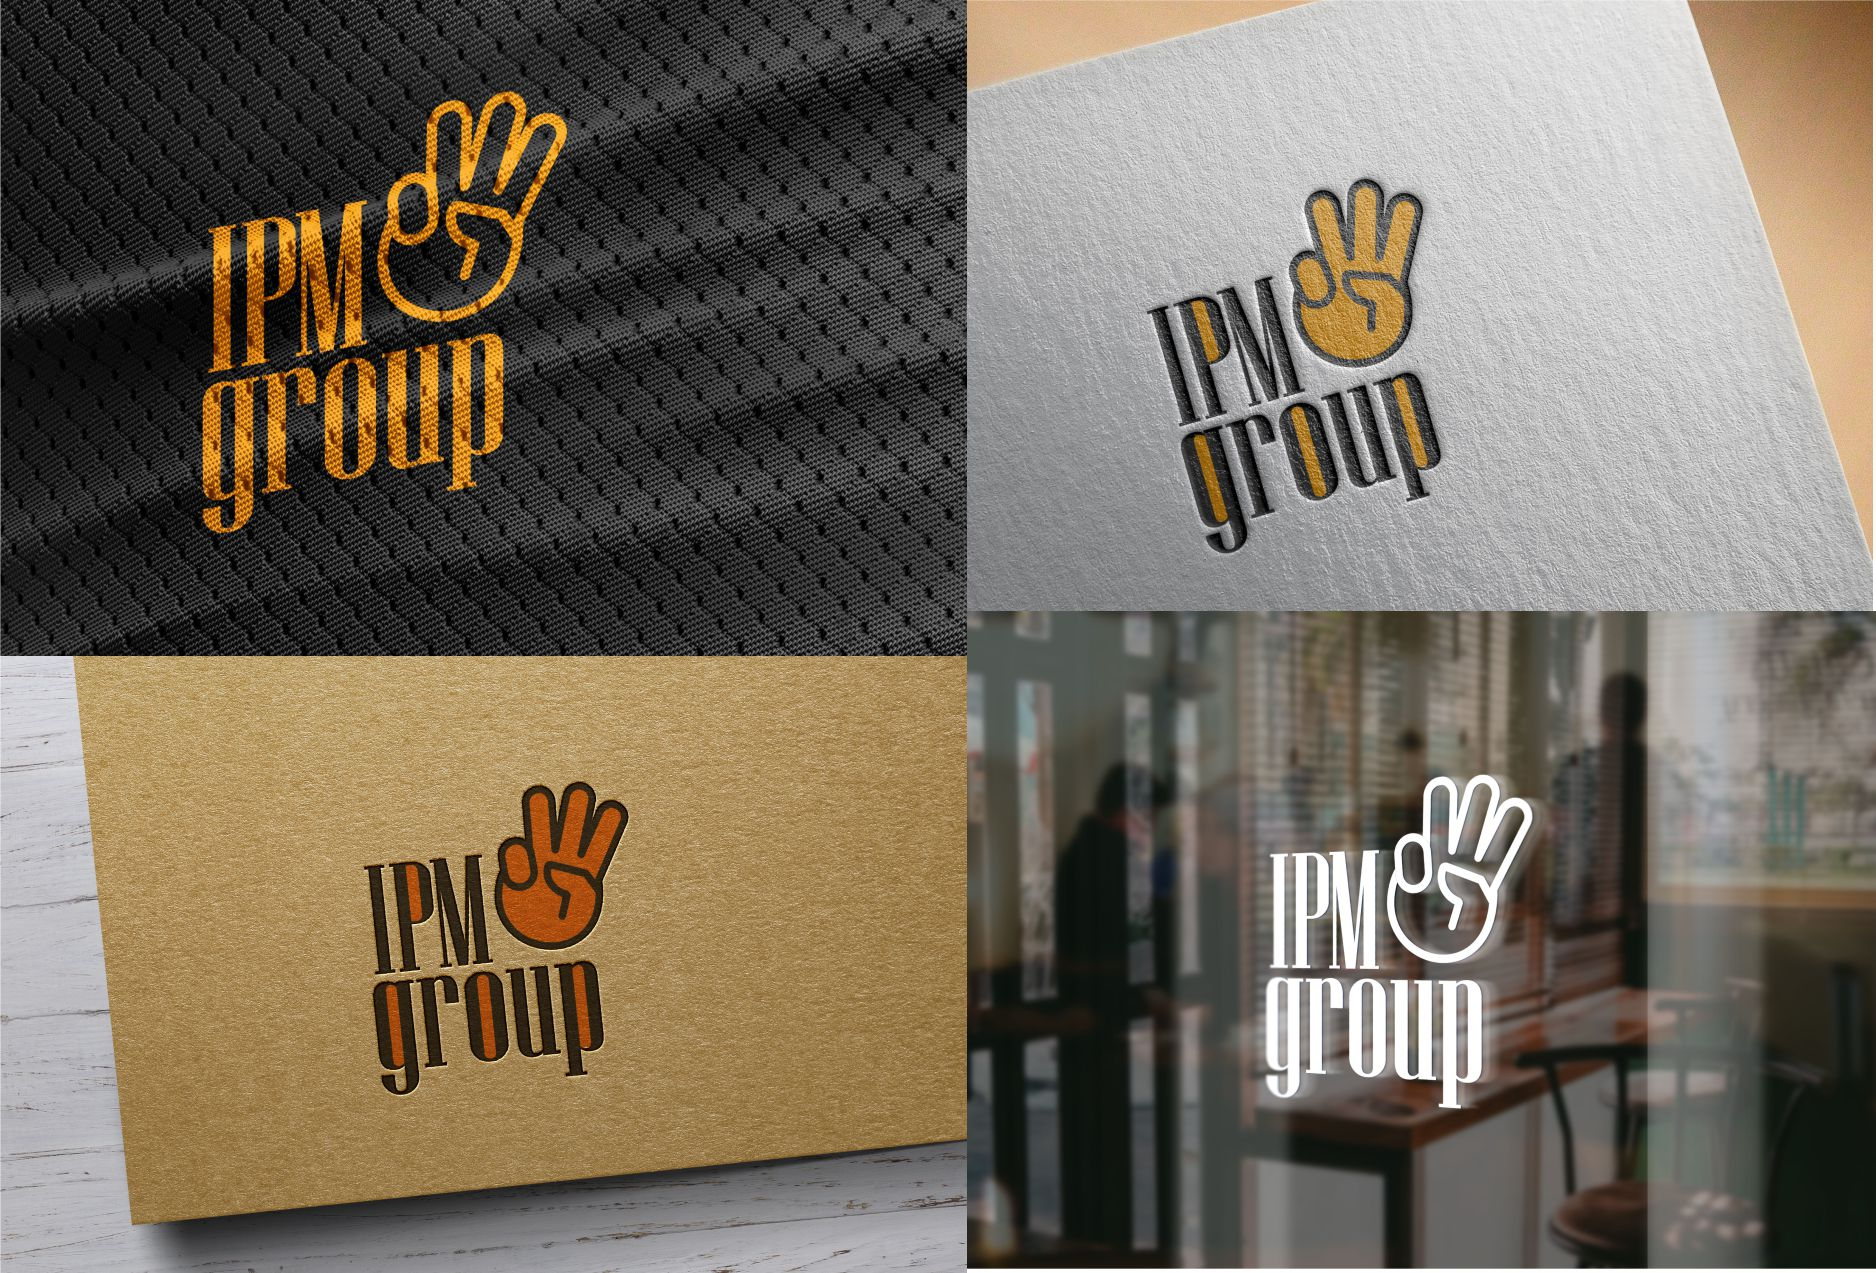 Разработка логотипа для управляющей компании фото f_0715f8384553eac1.jpg